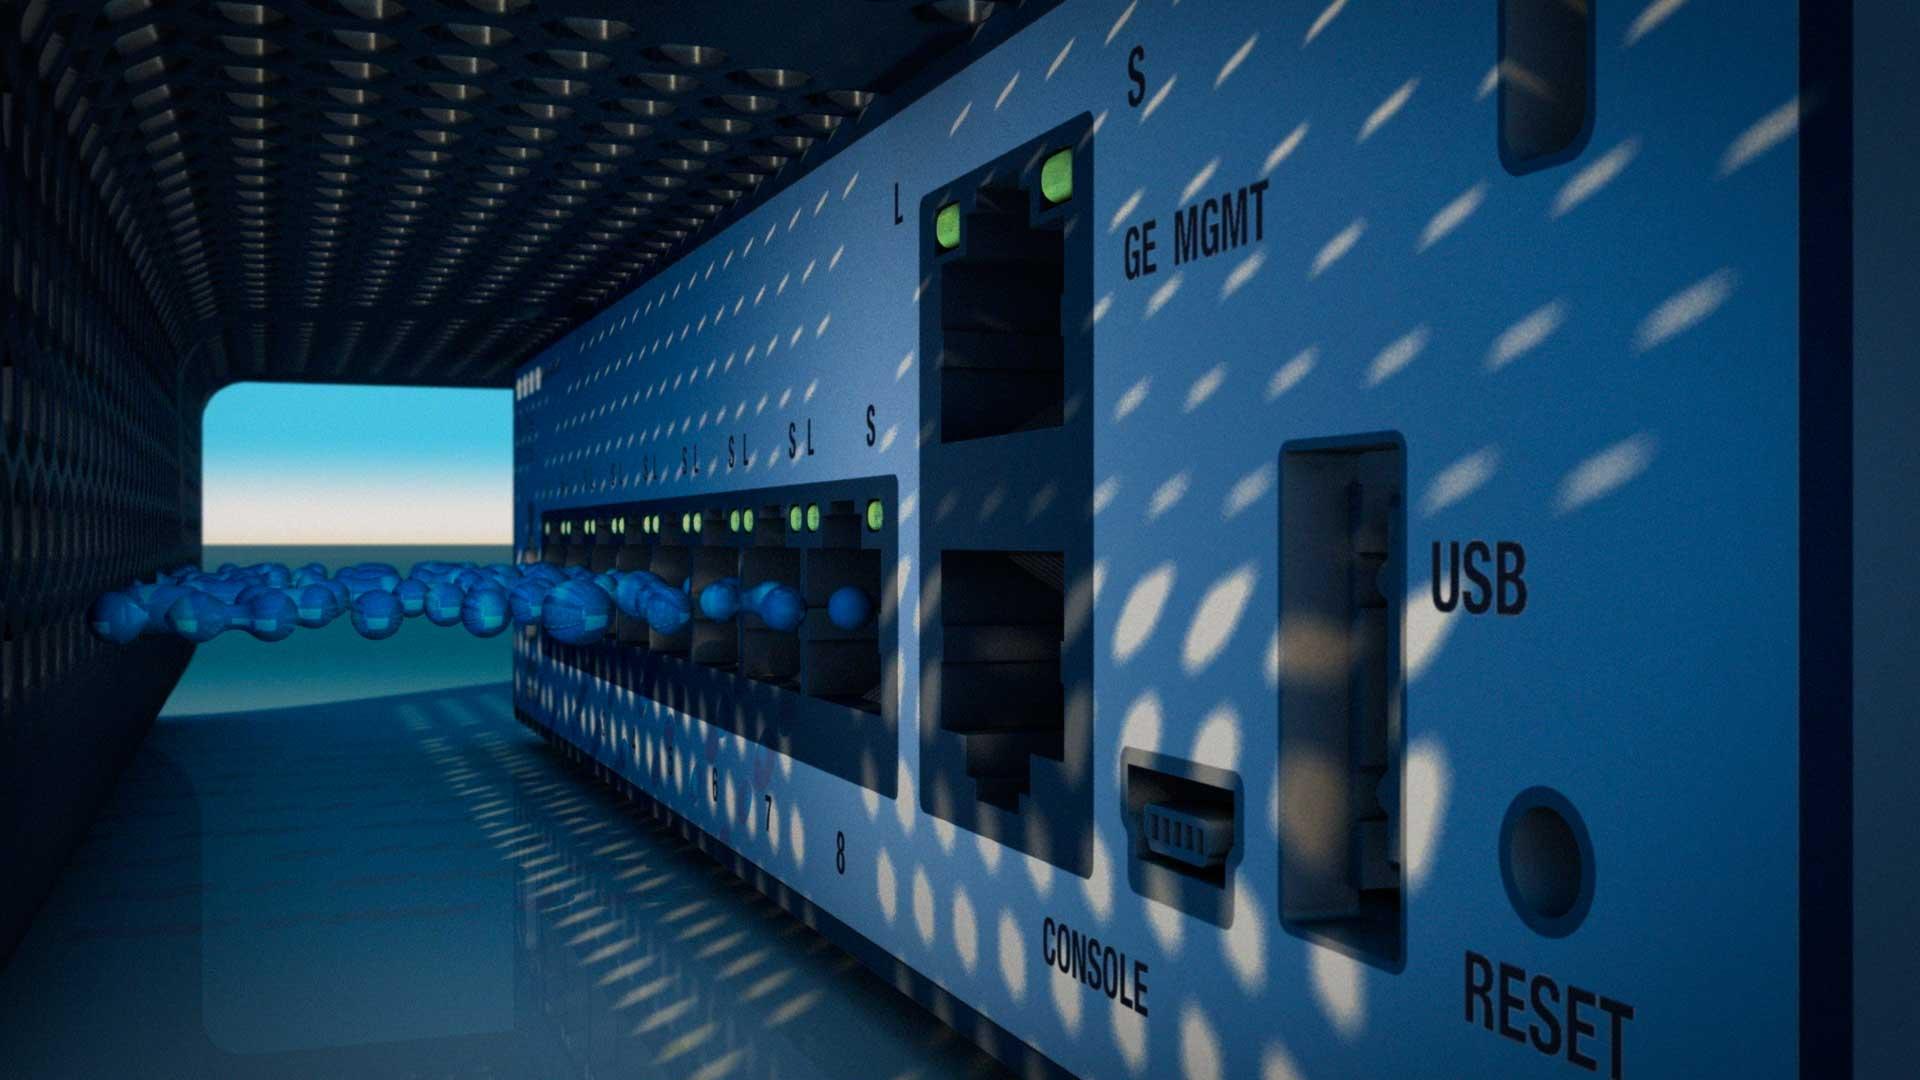 Cisco 5506-X Overview Video